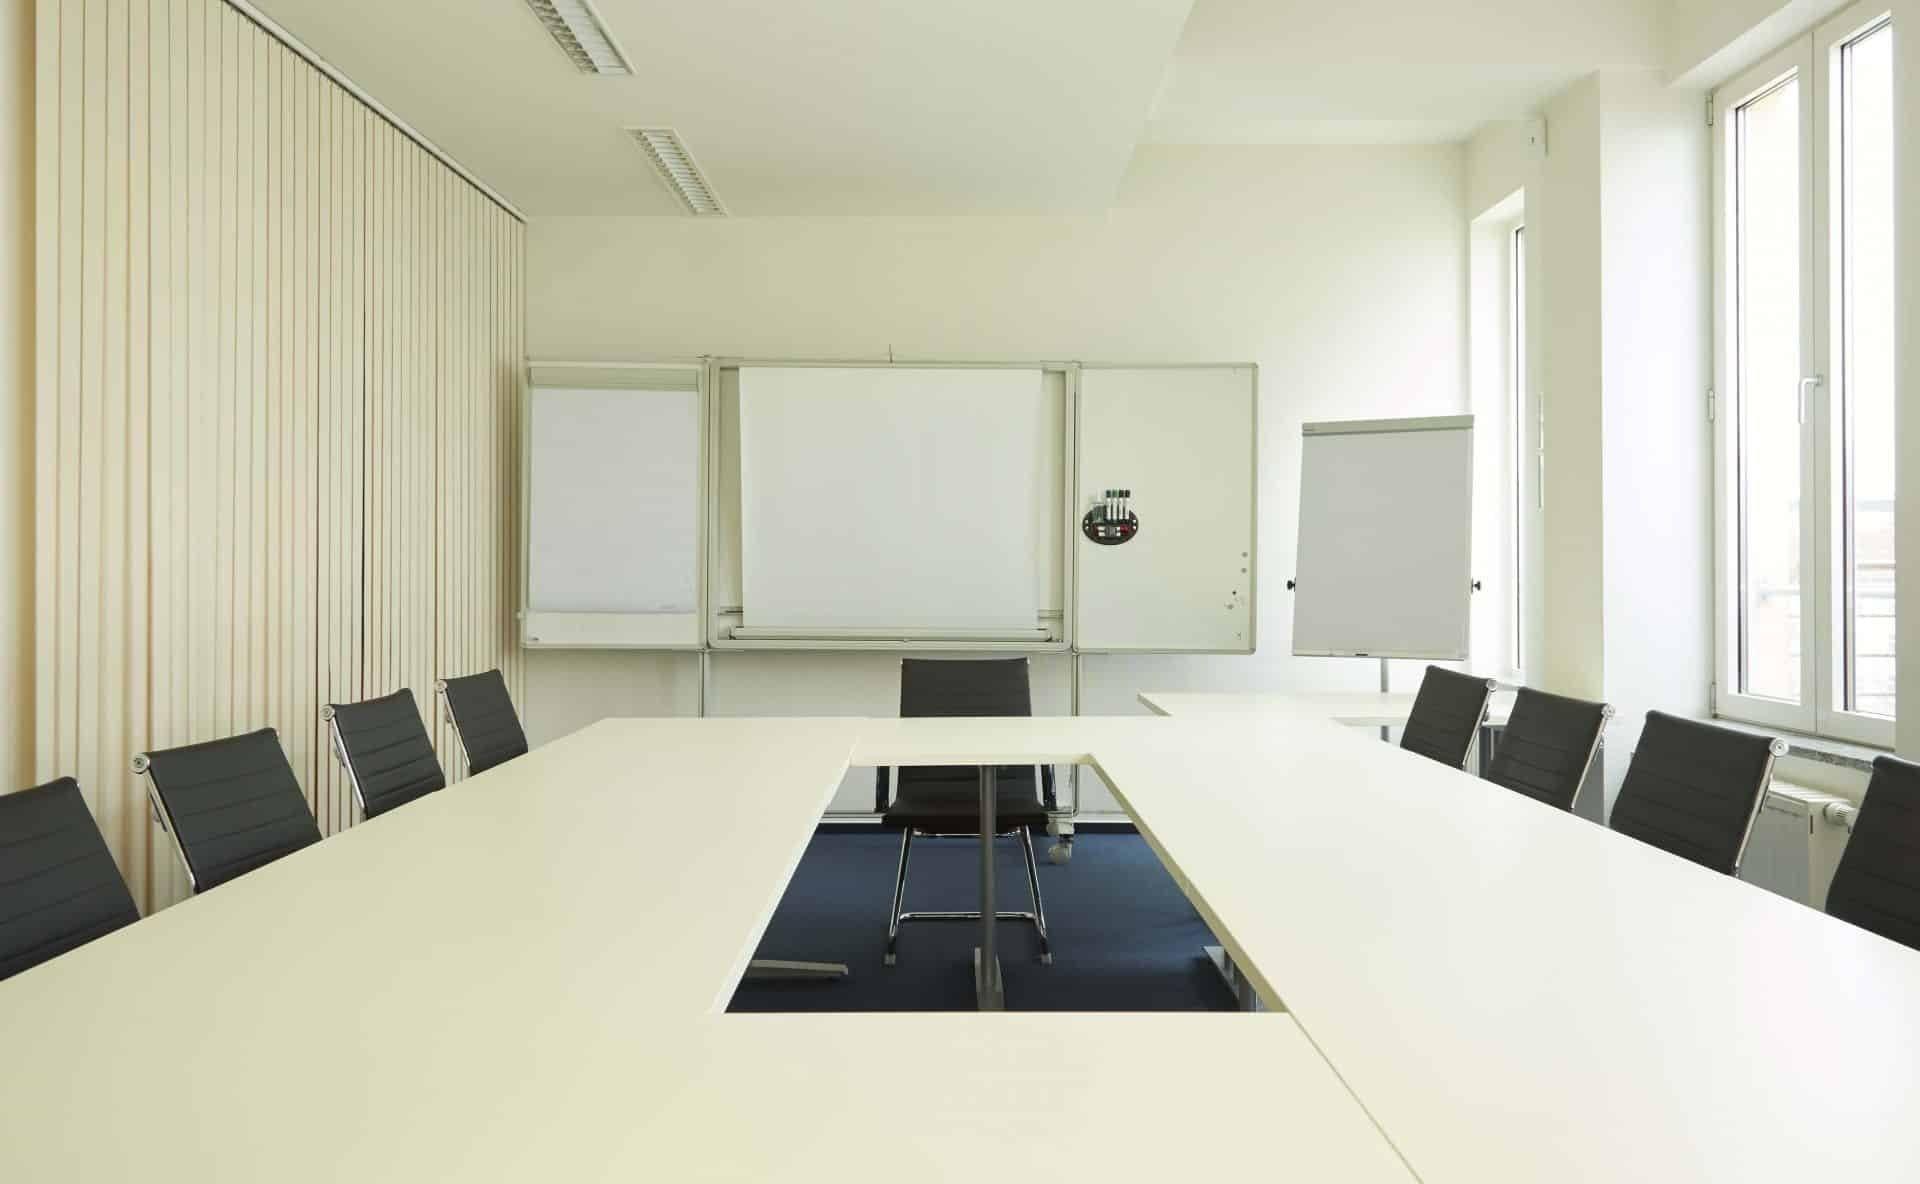 Seminarraum 3   itb - Institut für Training und Beratung in Hamburg